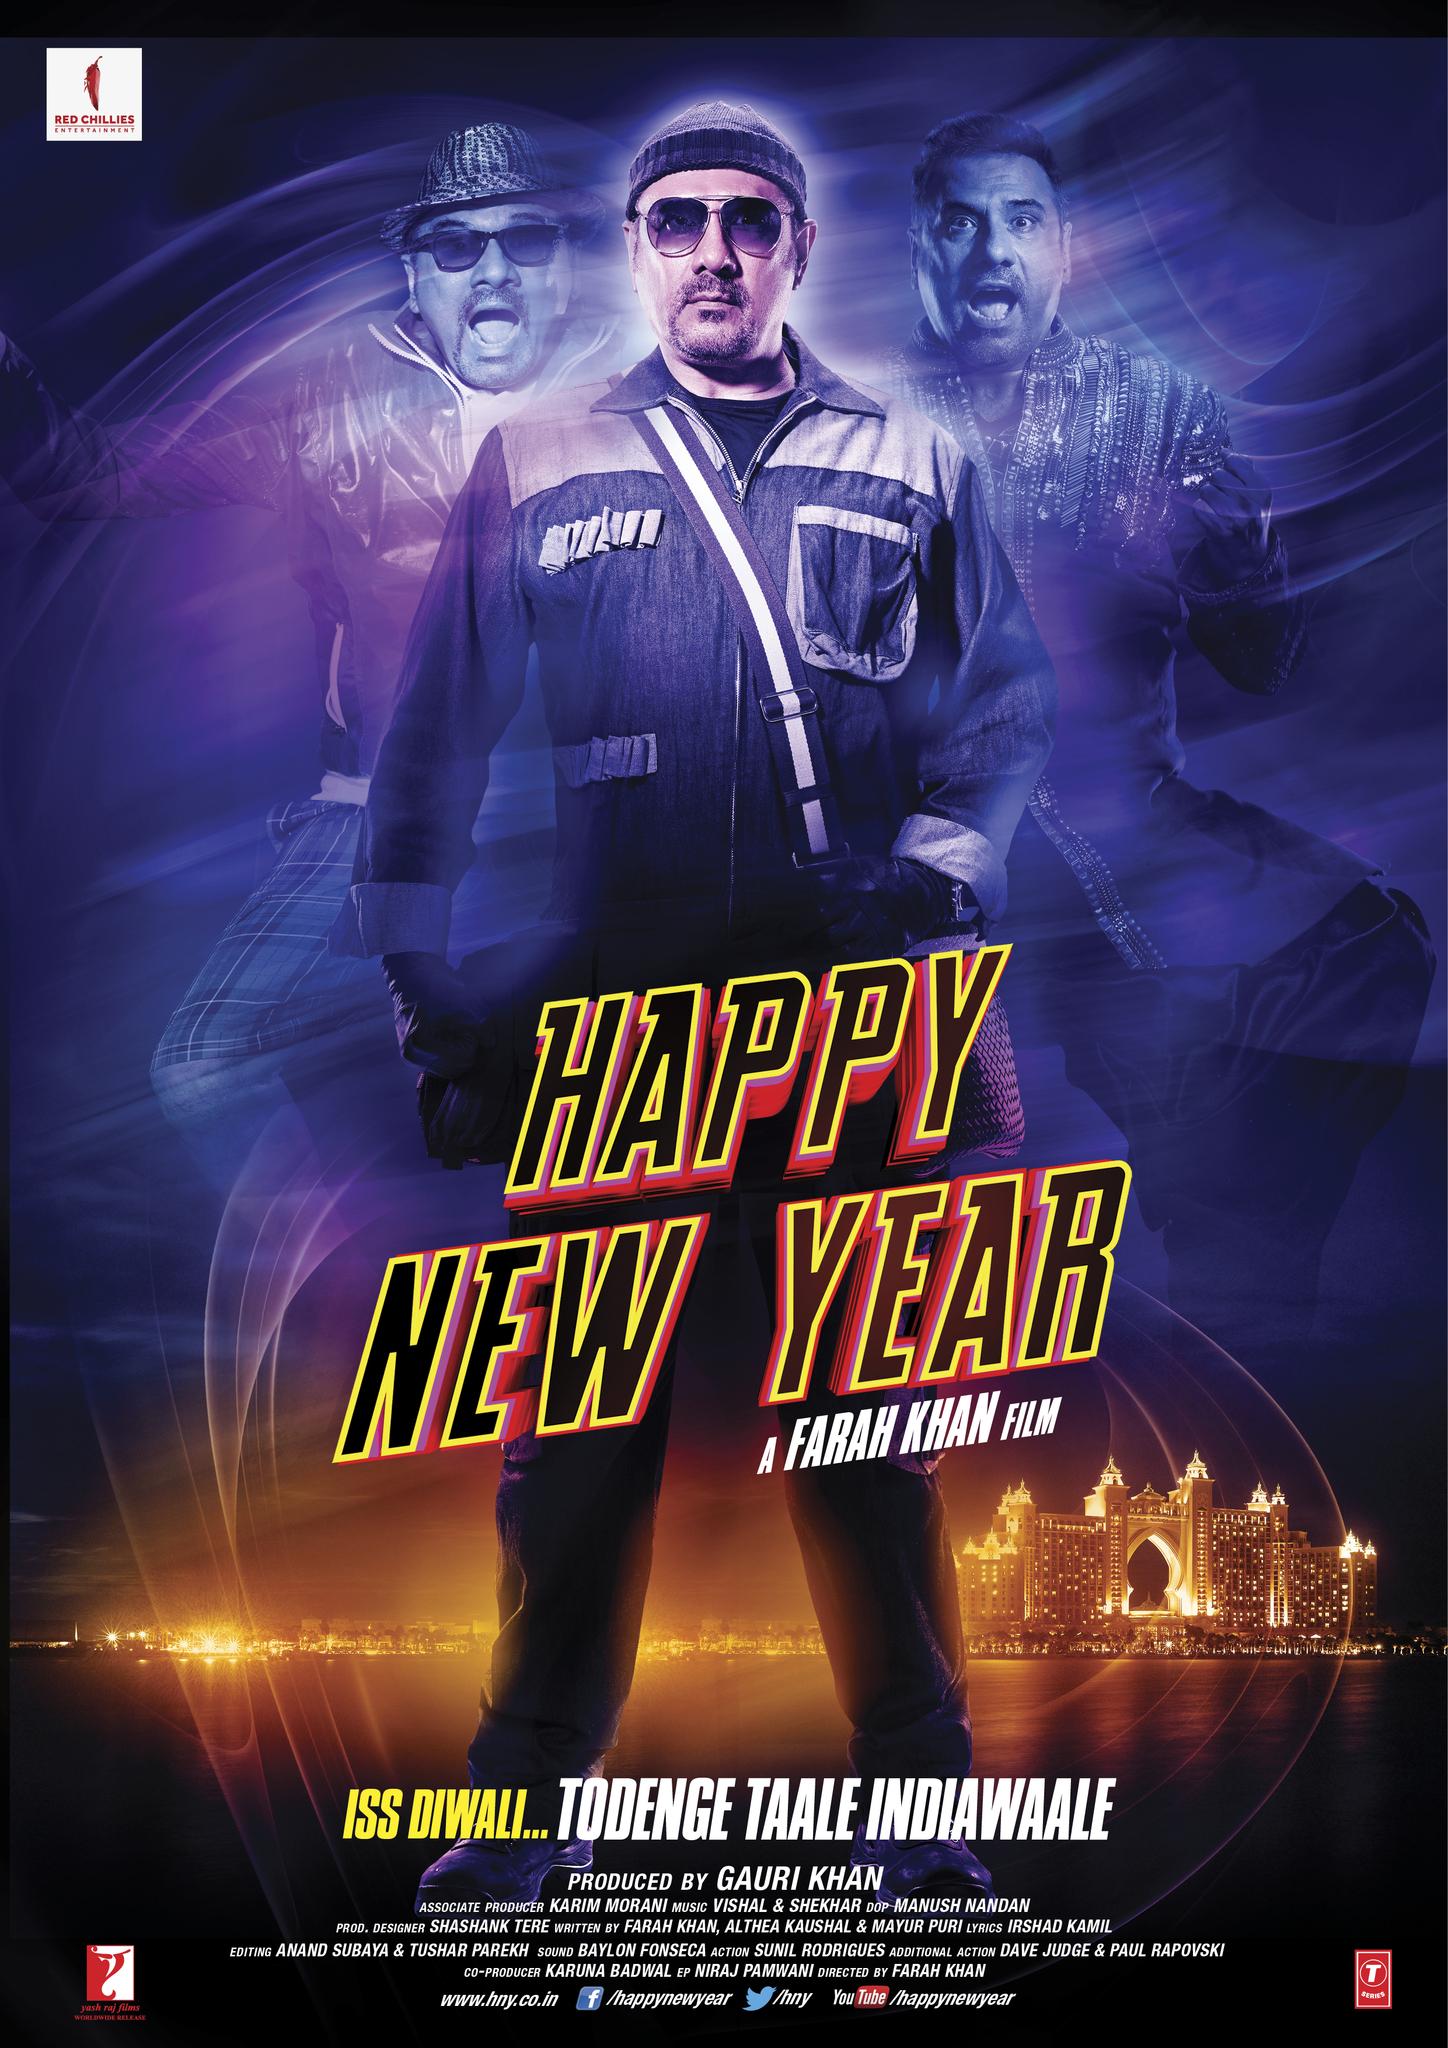 Happy New Year 2014 Photo Gallery Imdb